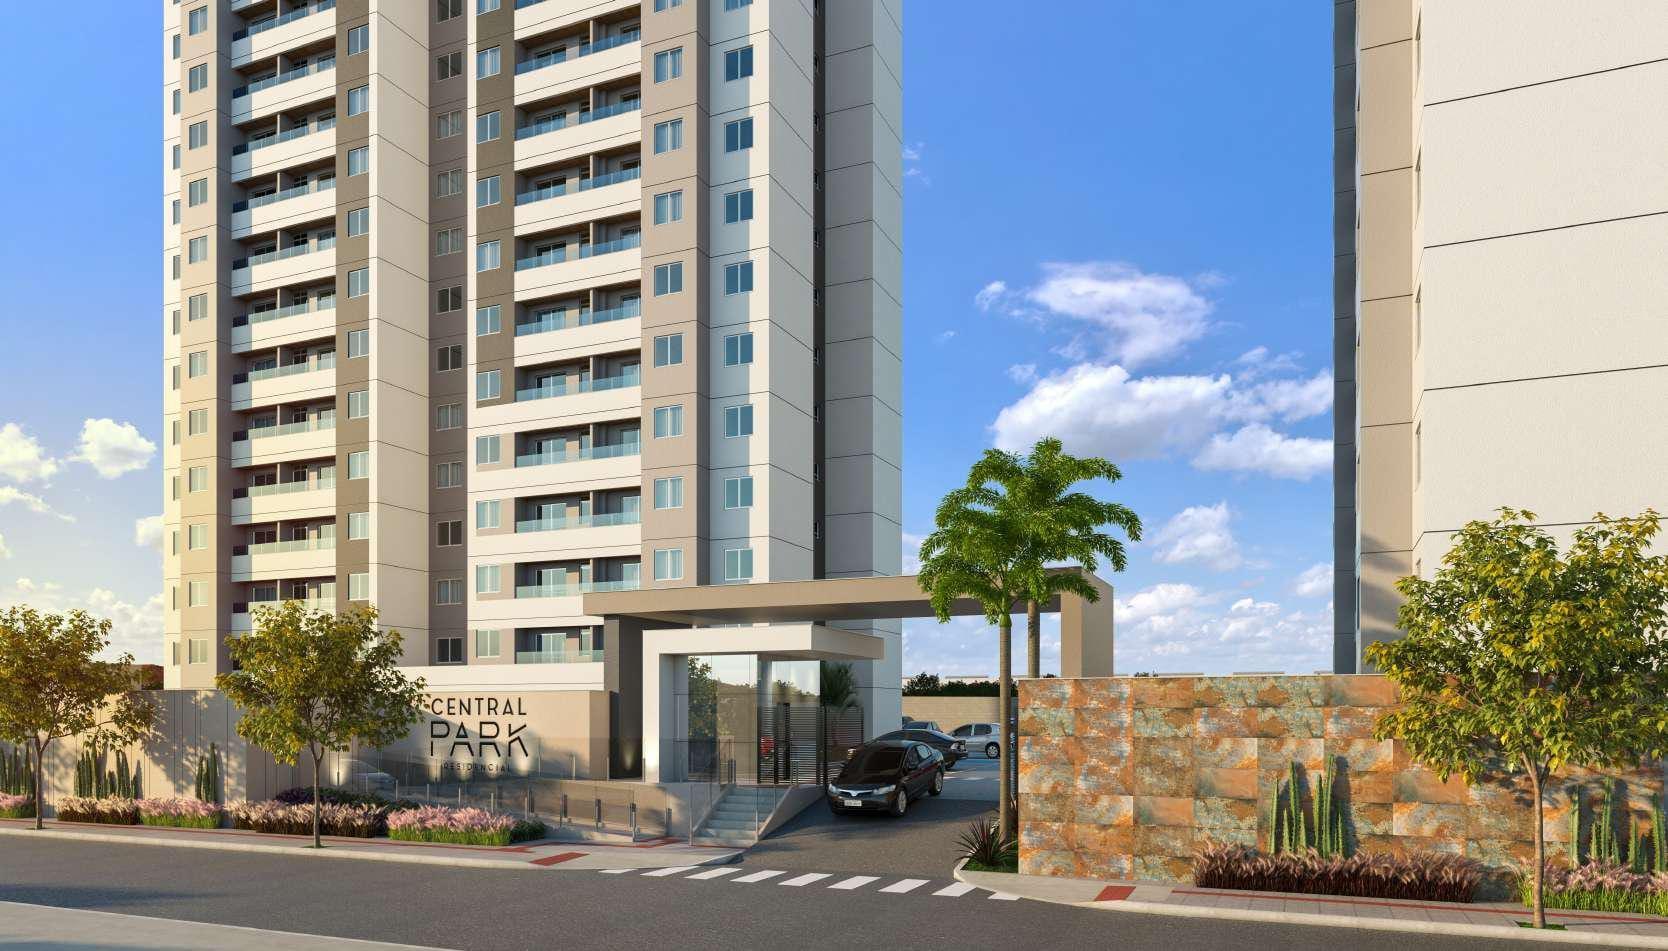 https://static.arboimoveis.com.br/AP0010_JC/apartamentoavendaaeroclubenovaiguacurj_1632158107749.jpg